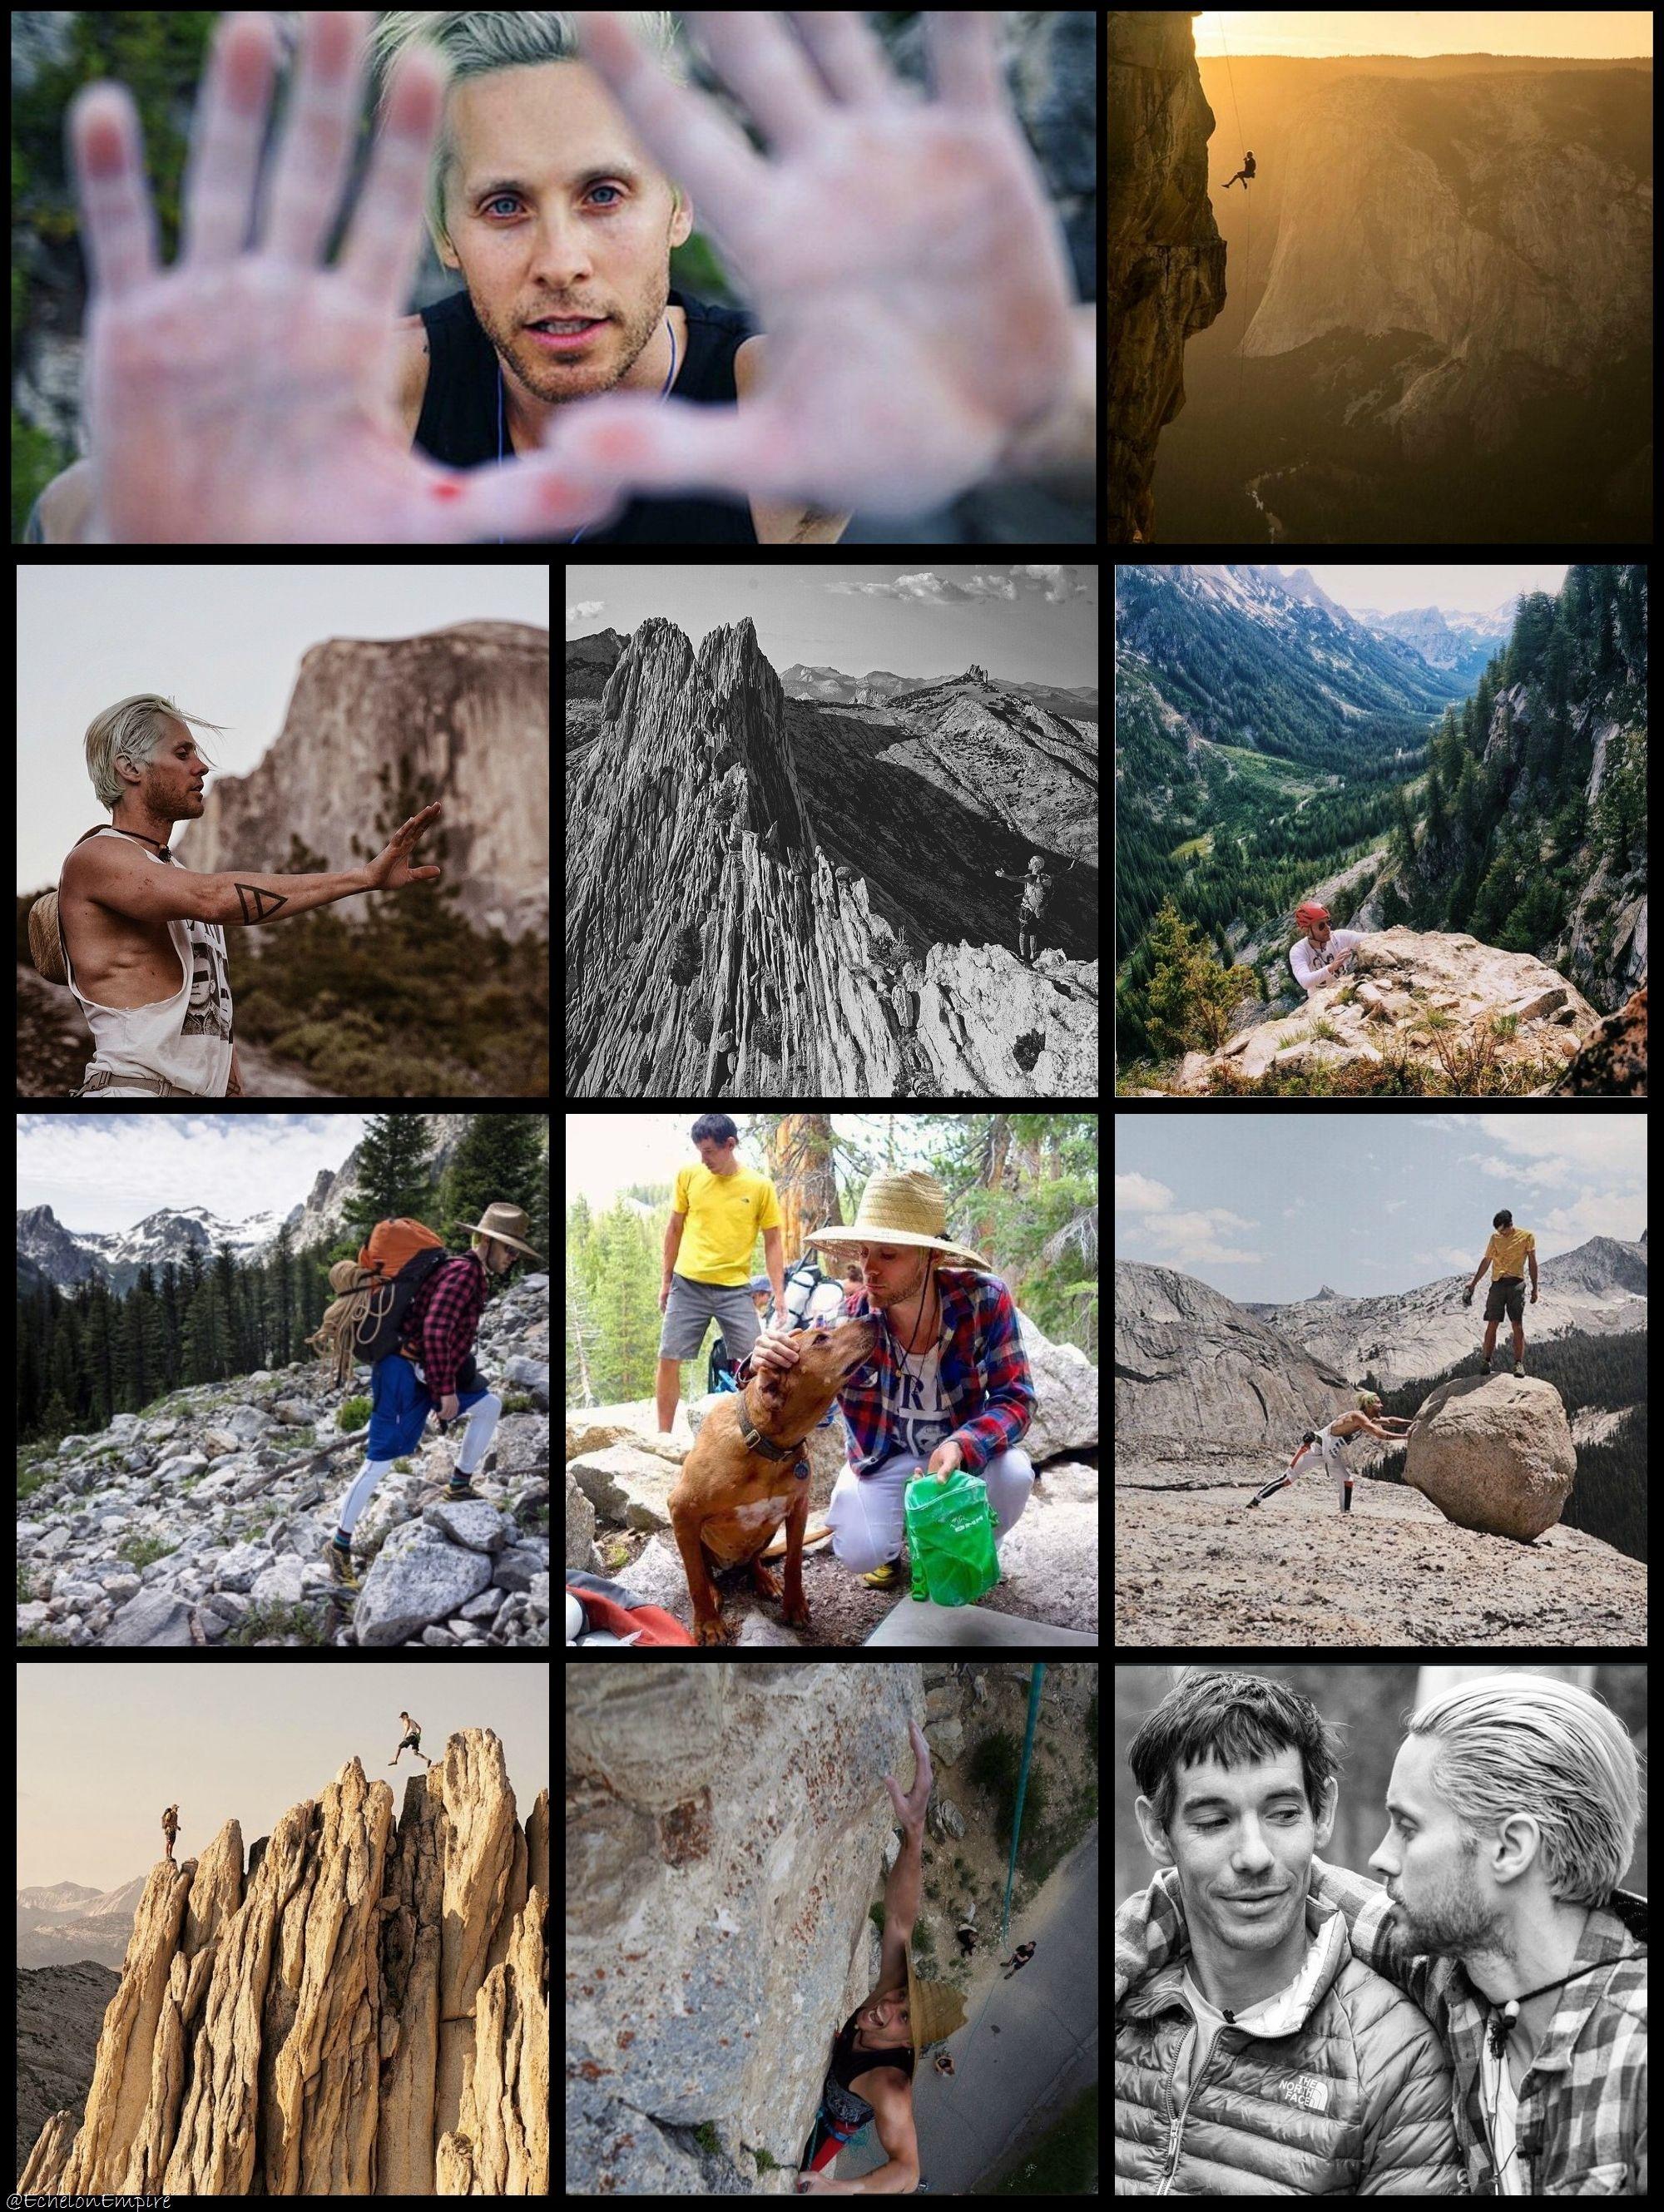 #MARScollage | #Jared Leto adventures in #GreatWideOpen #30secondstomars